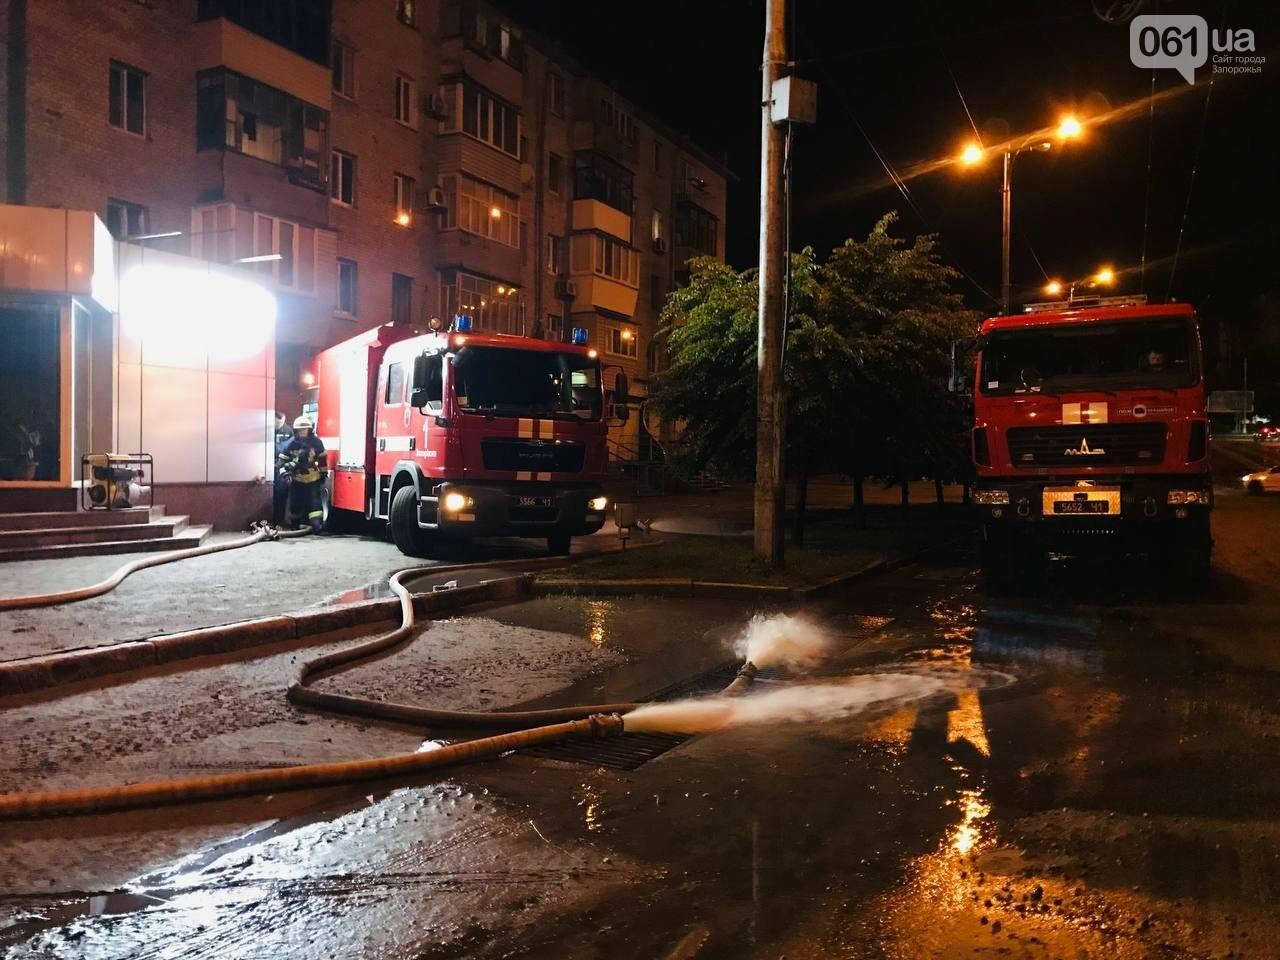 photo2021 06 1408 20 31 60c6fbb663e9b - В центре Запорожья из-за сильного ливня в воде застряли автомобили и подтопило многоэтажку